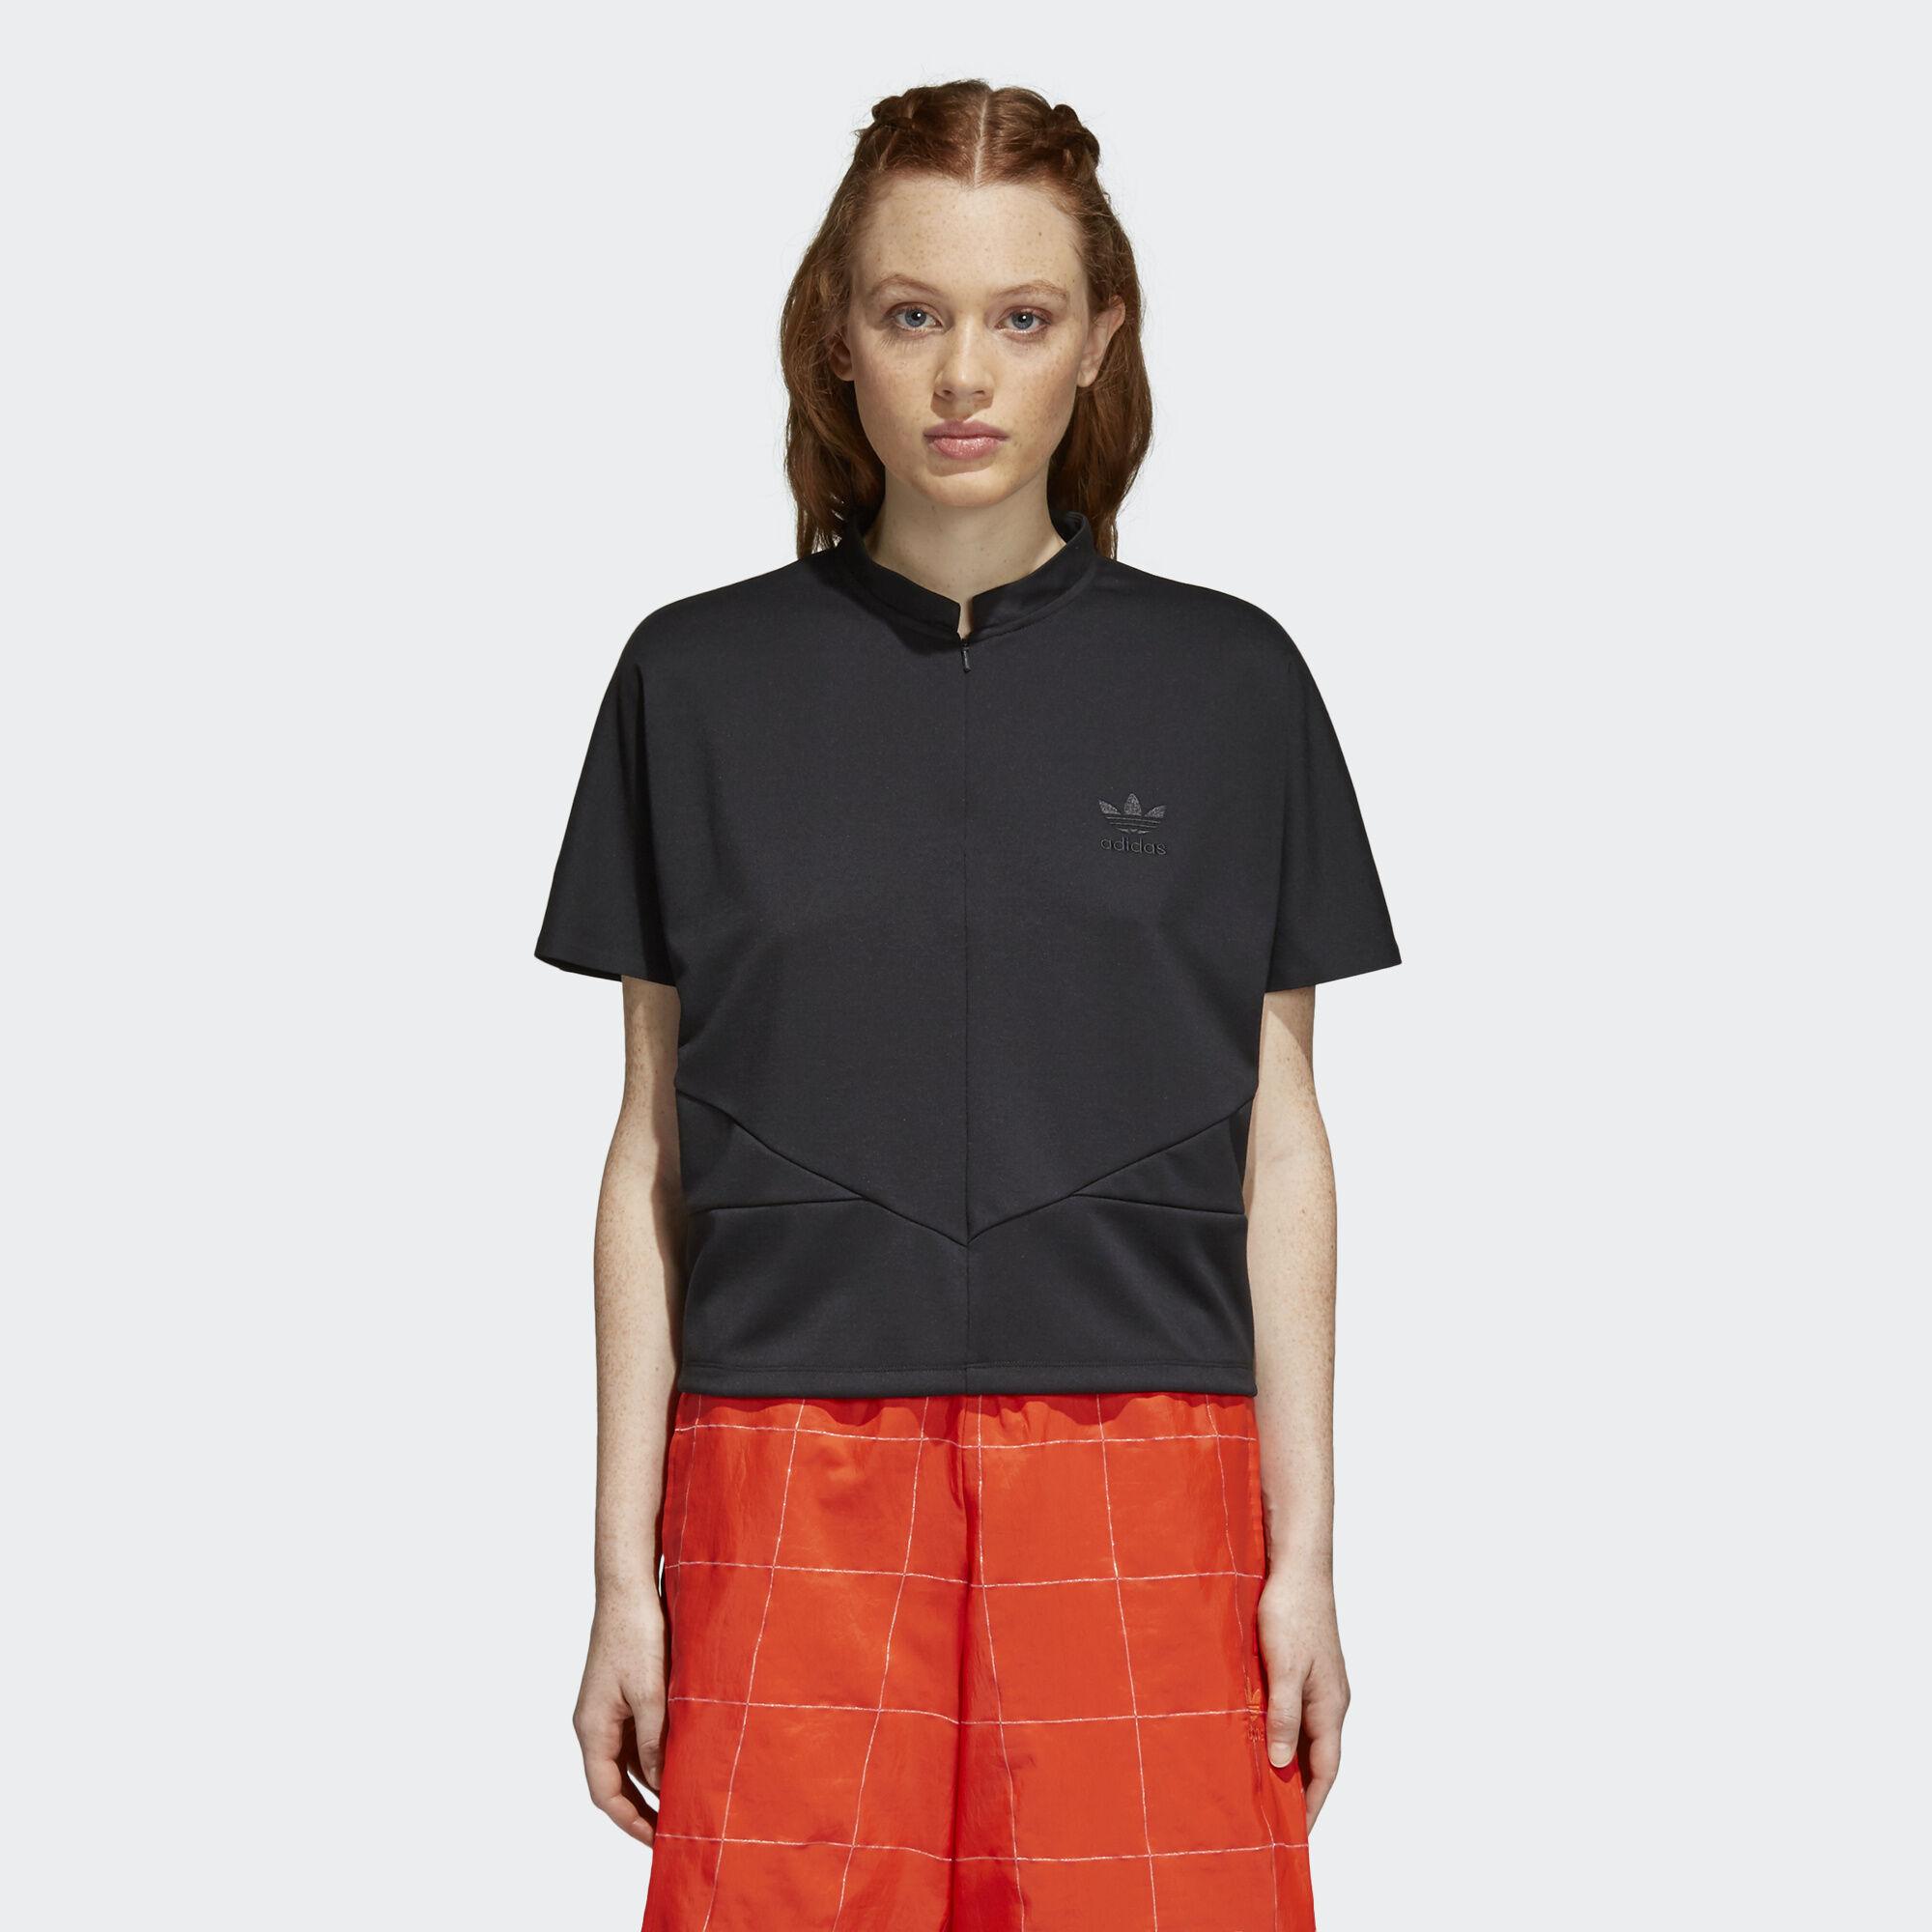 camiseta clrdo